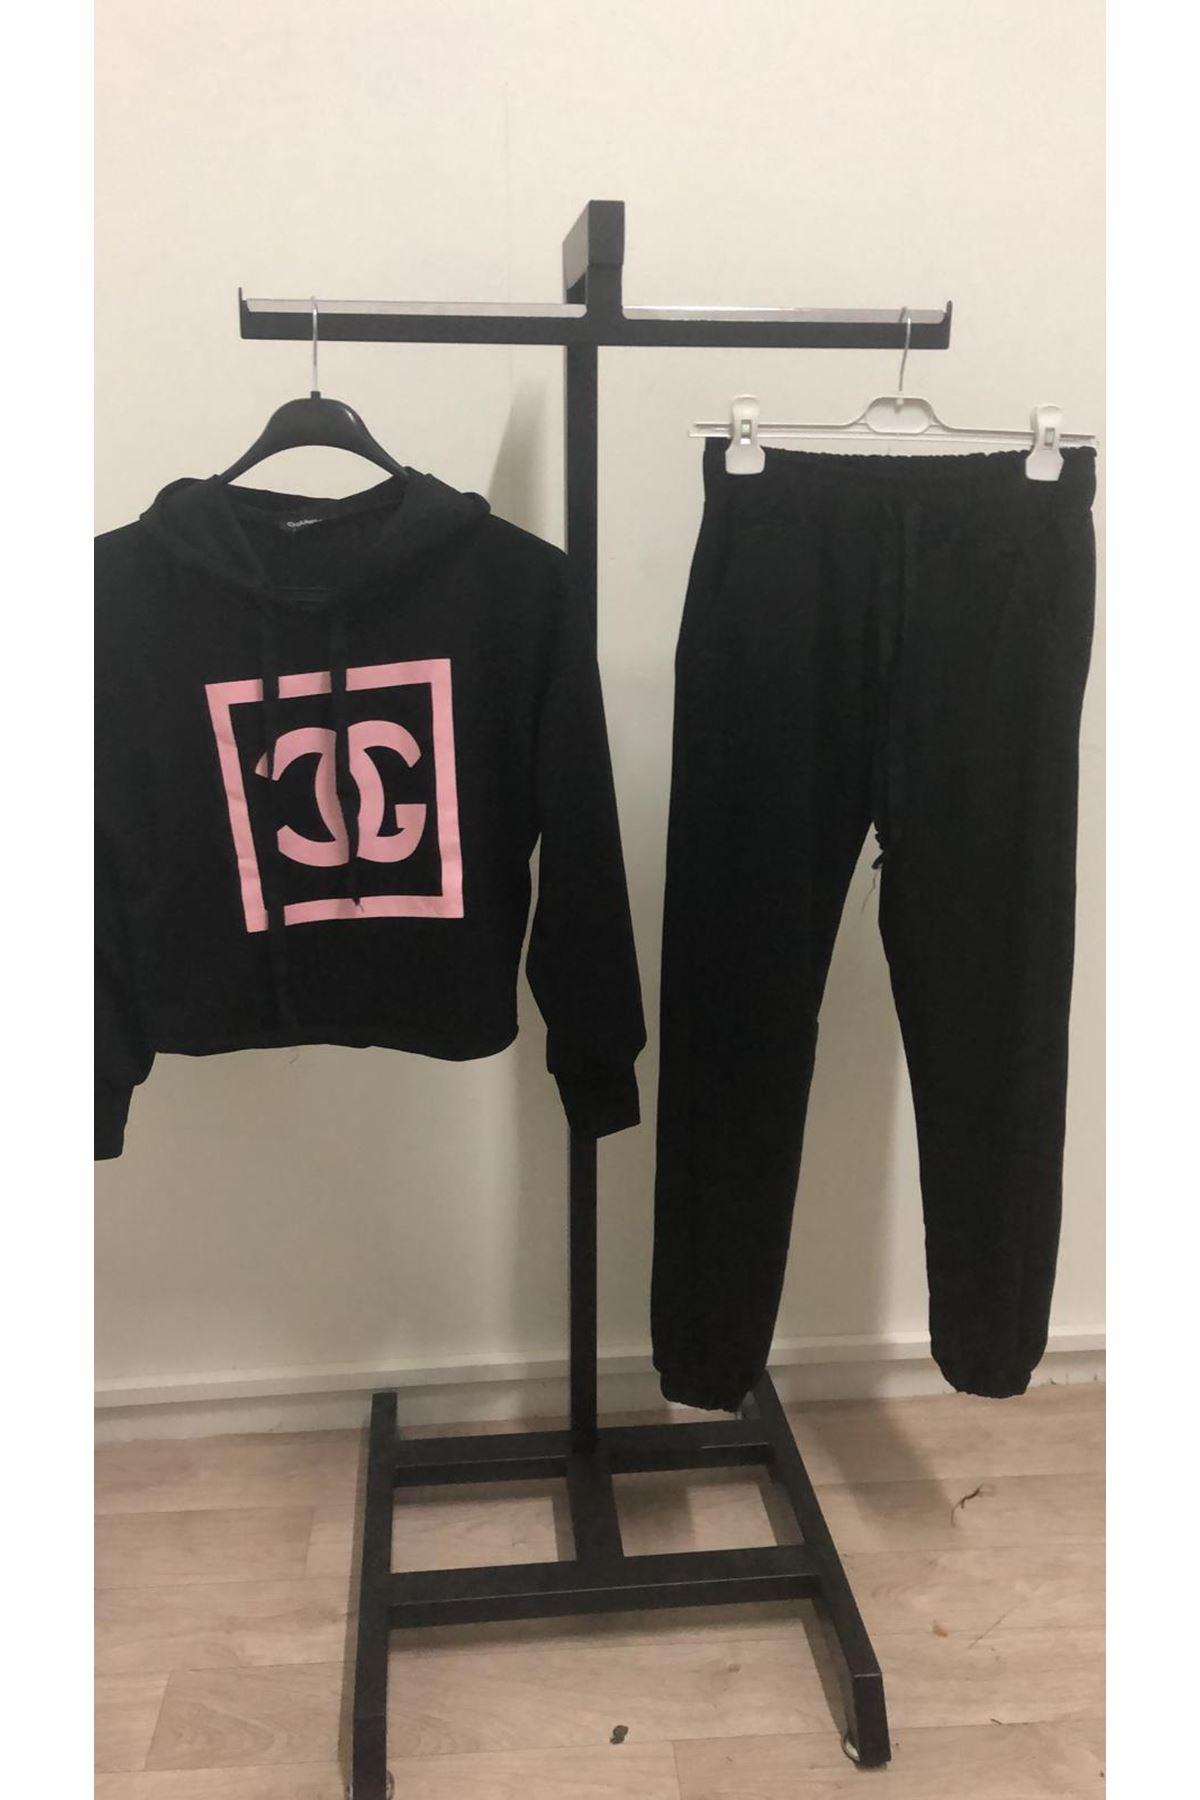 Chanel kapşonlu İkili takım-SİYAH